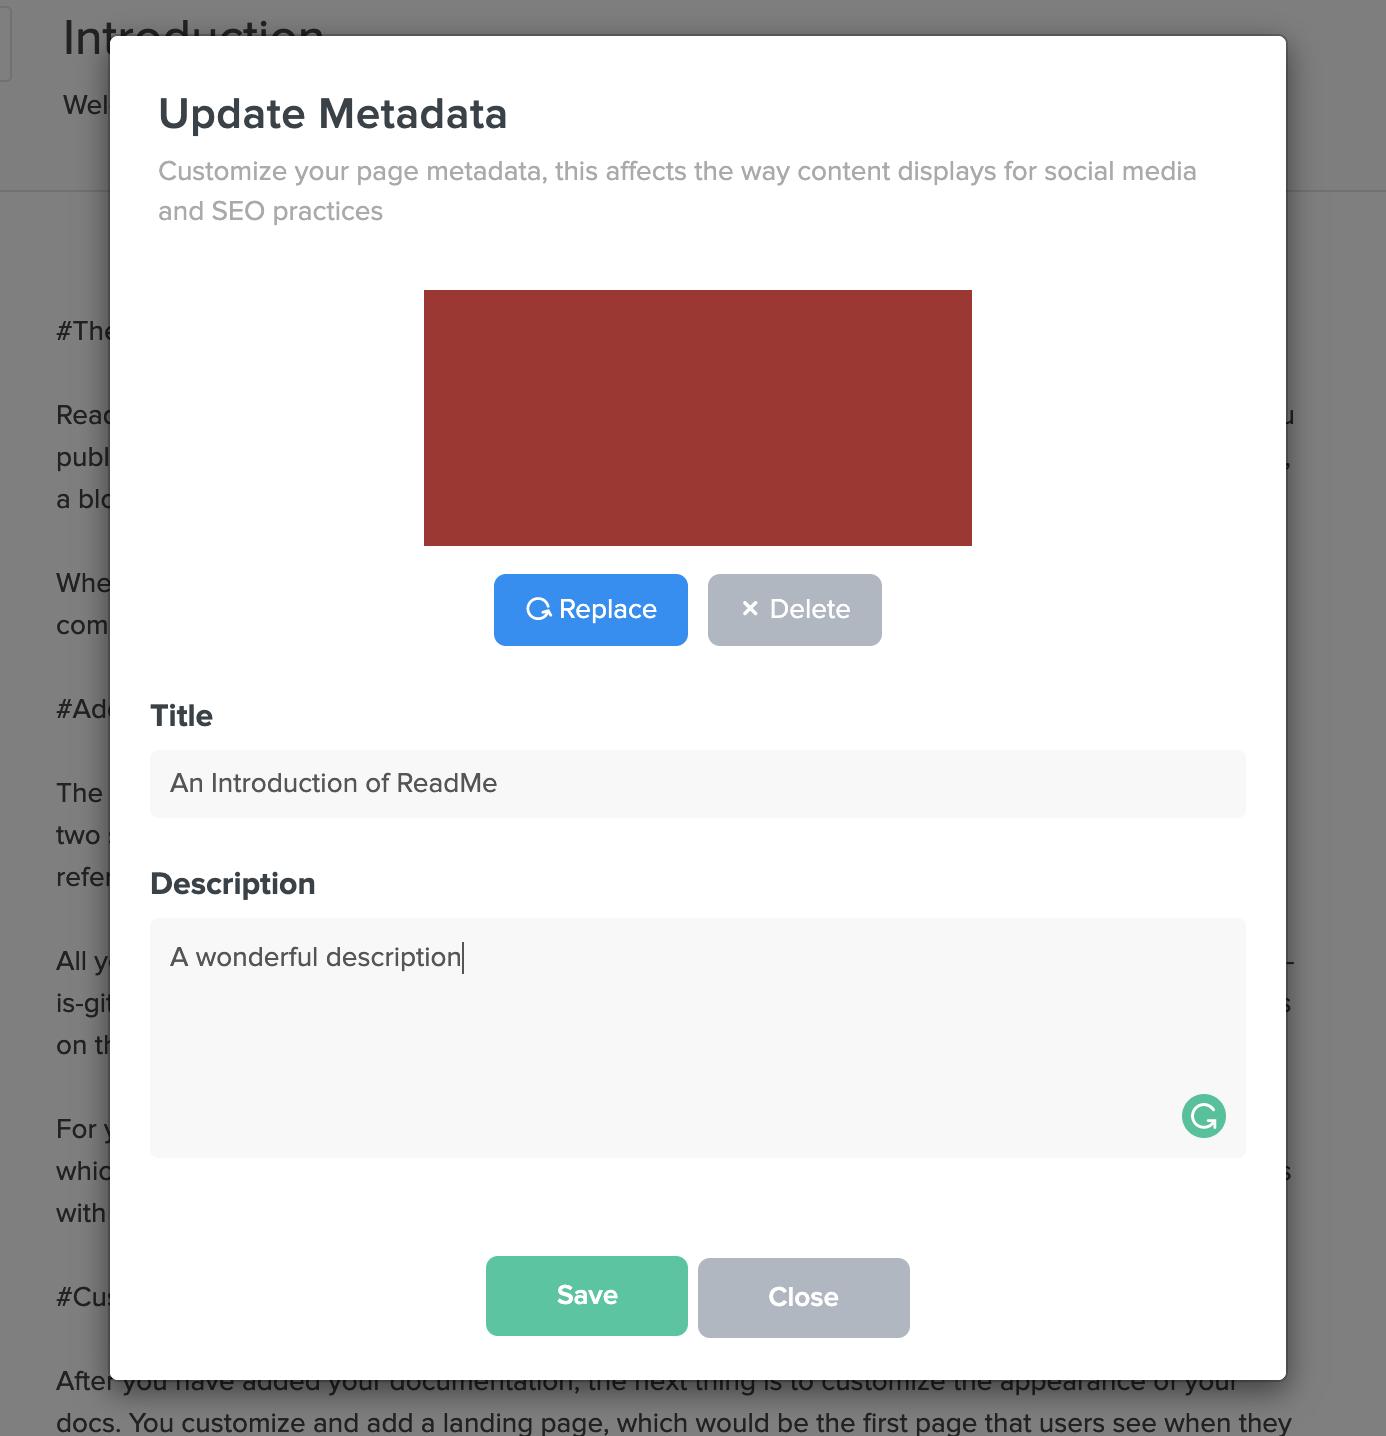 Update Metadata Modal